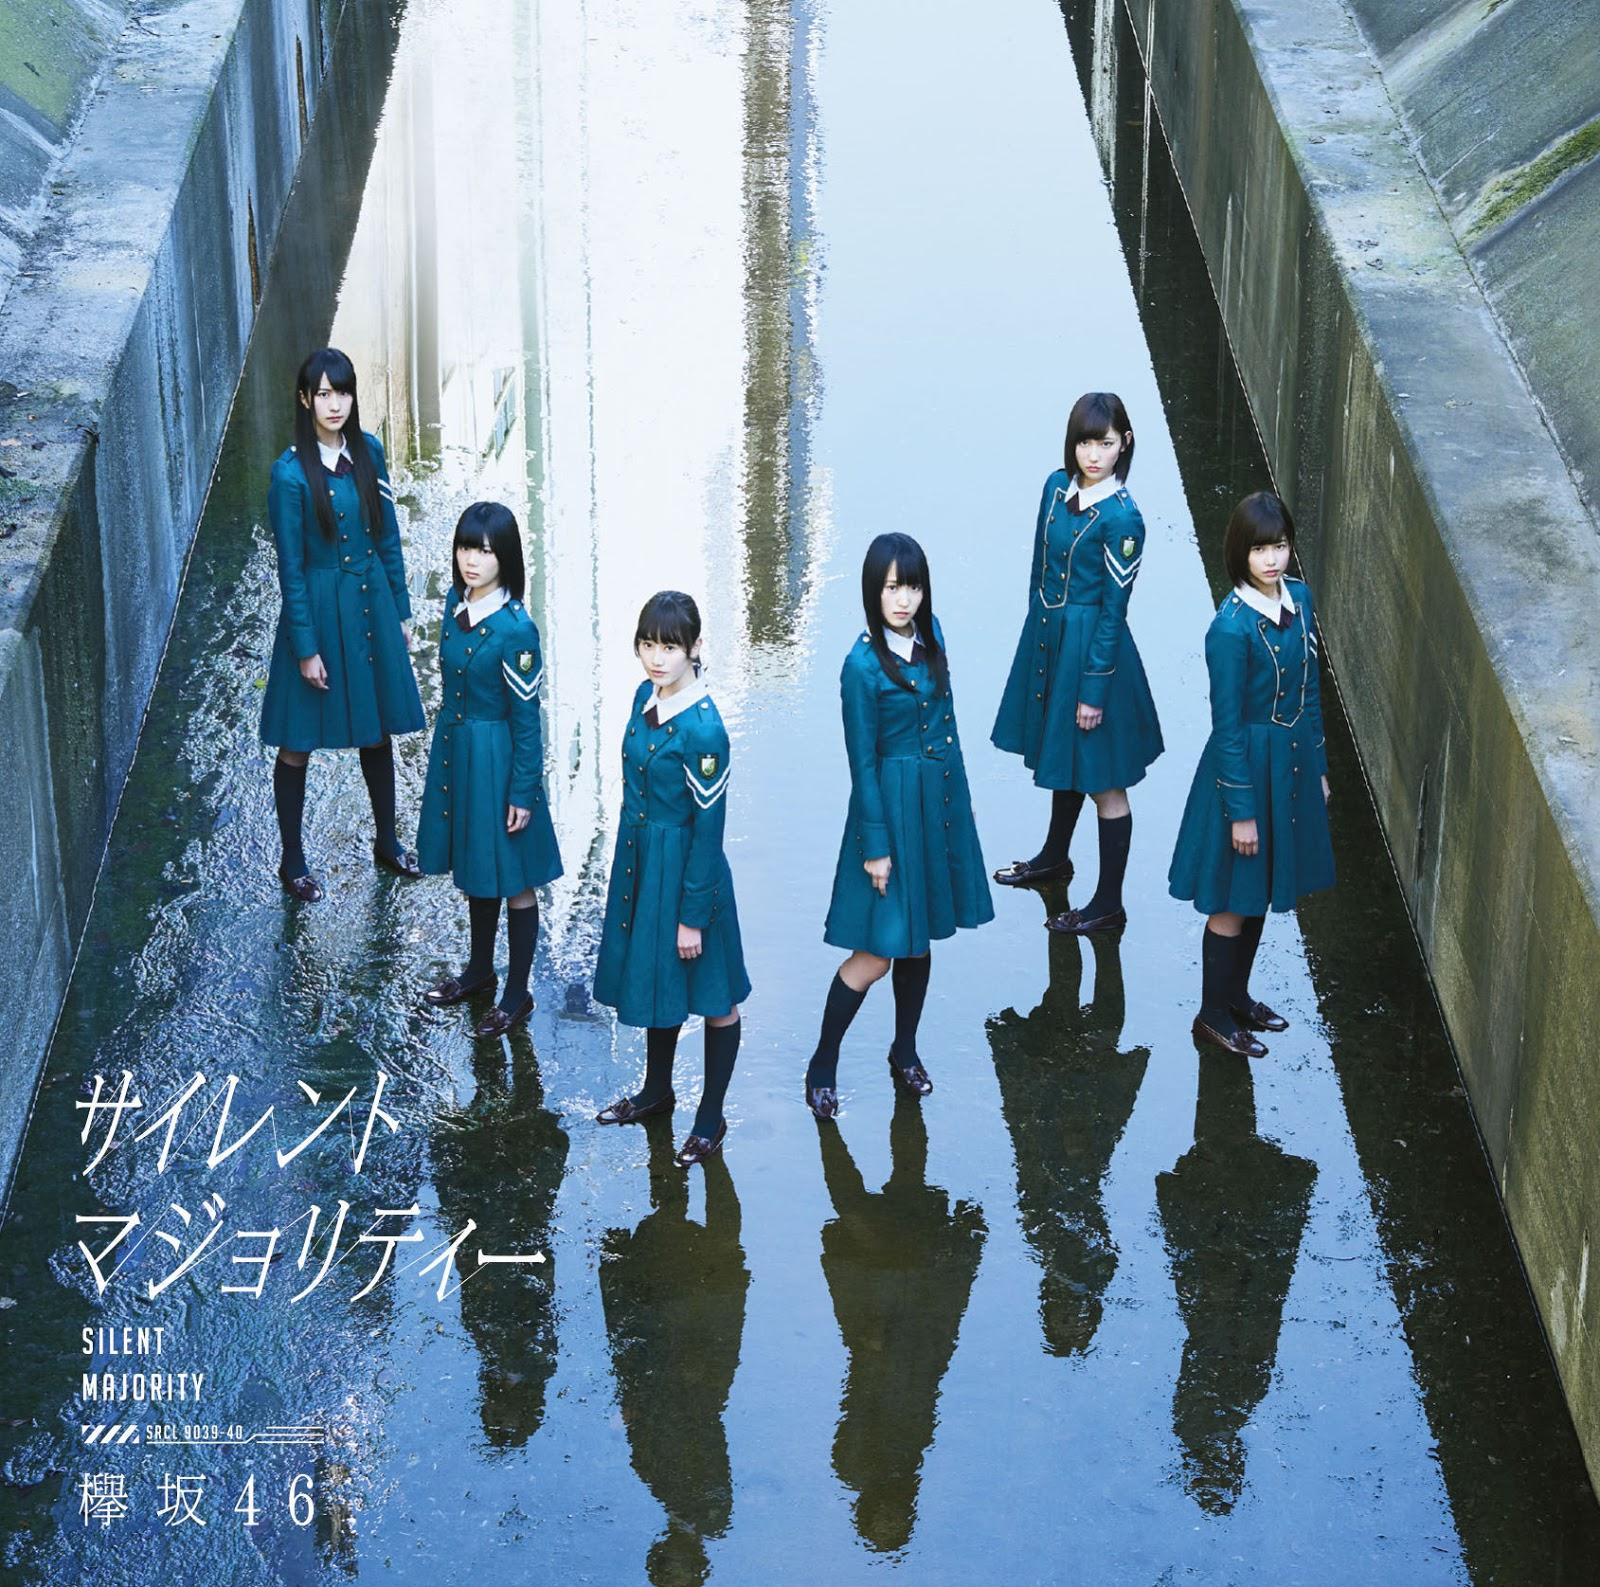 Keyakizaka46 - Te wo Tsunaide Kaerou ka?